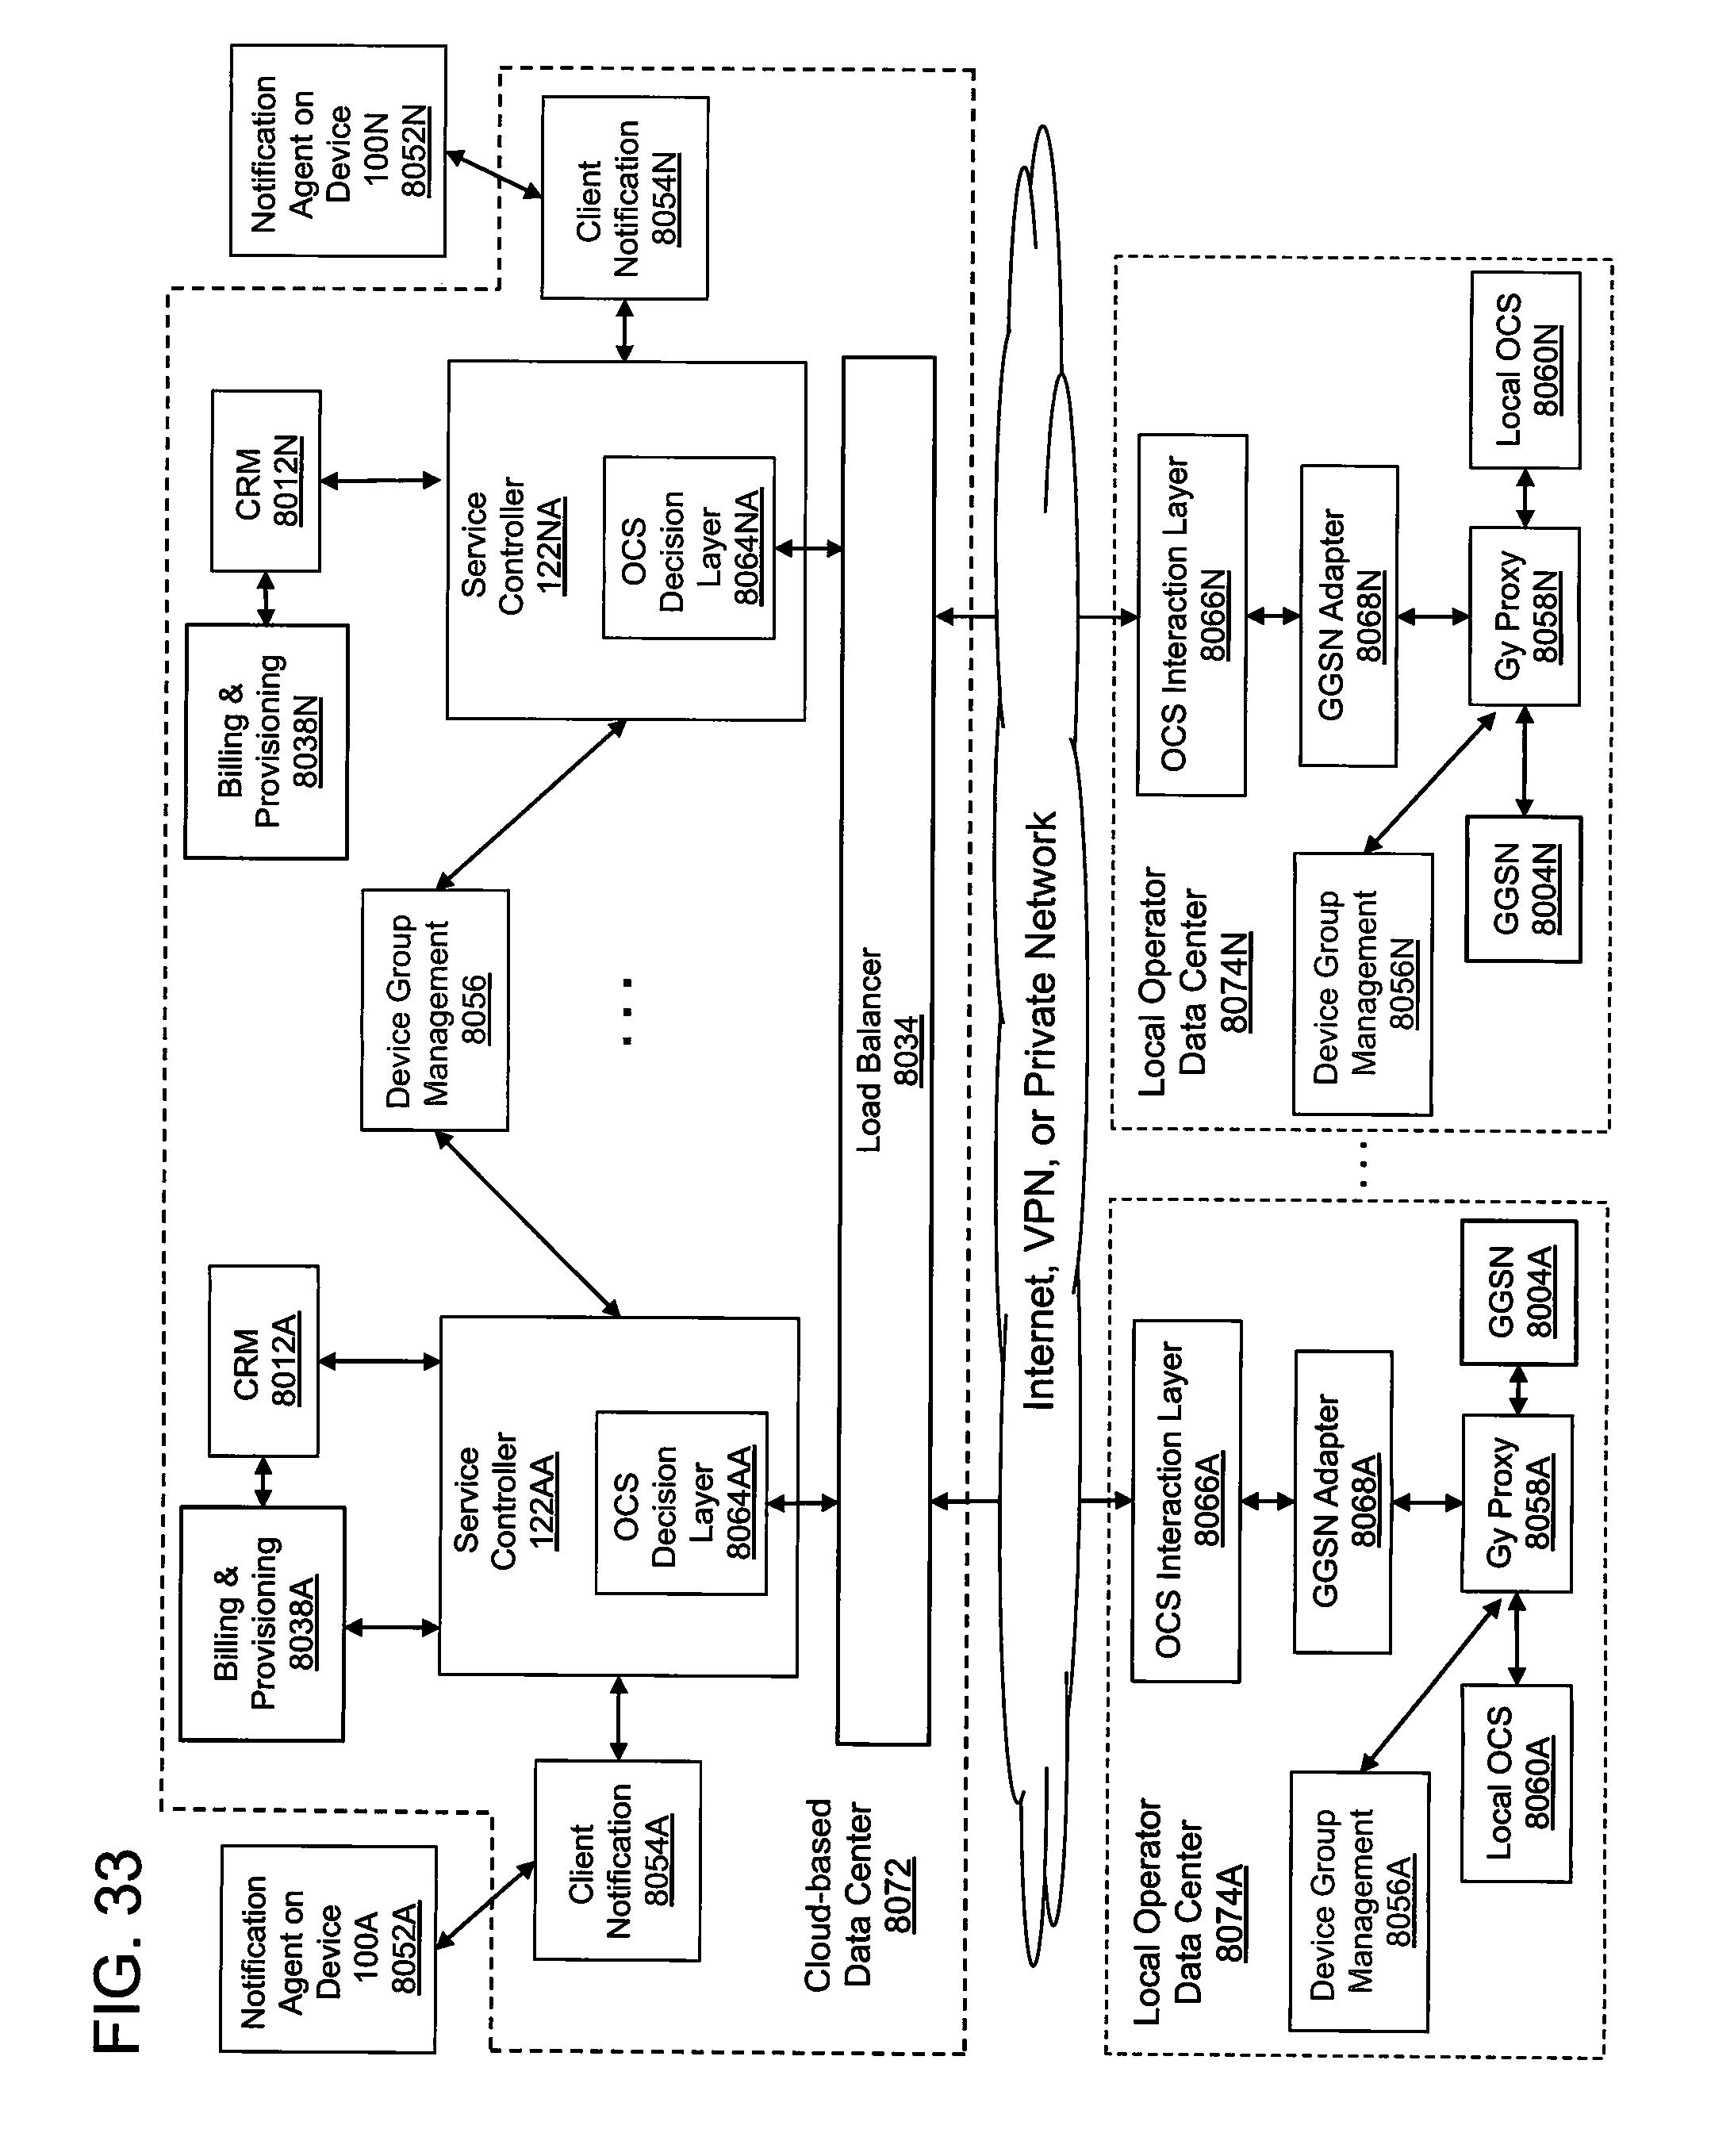 Patent Us 10057775 B2 Contigo Gps Wiring Diagram Images